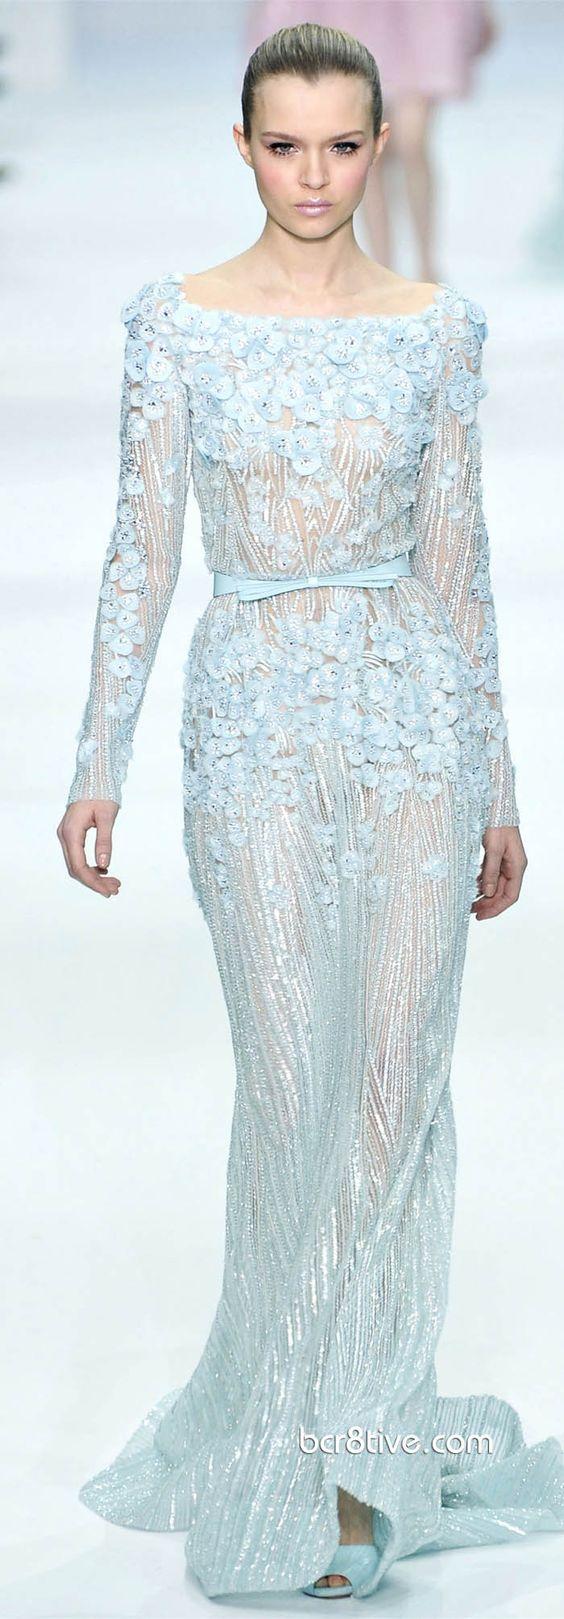 Elie Saab Spring Summer 2012 Haute Couture | Wedding ...